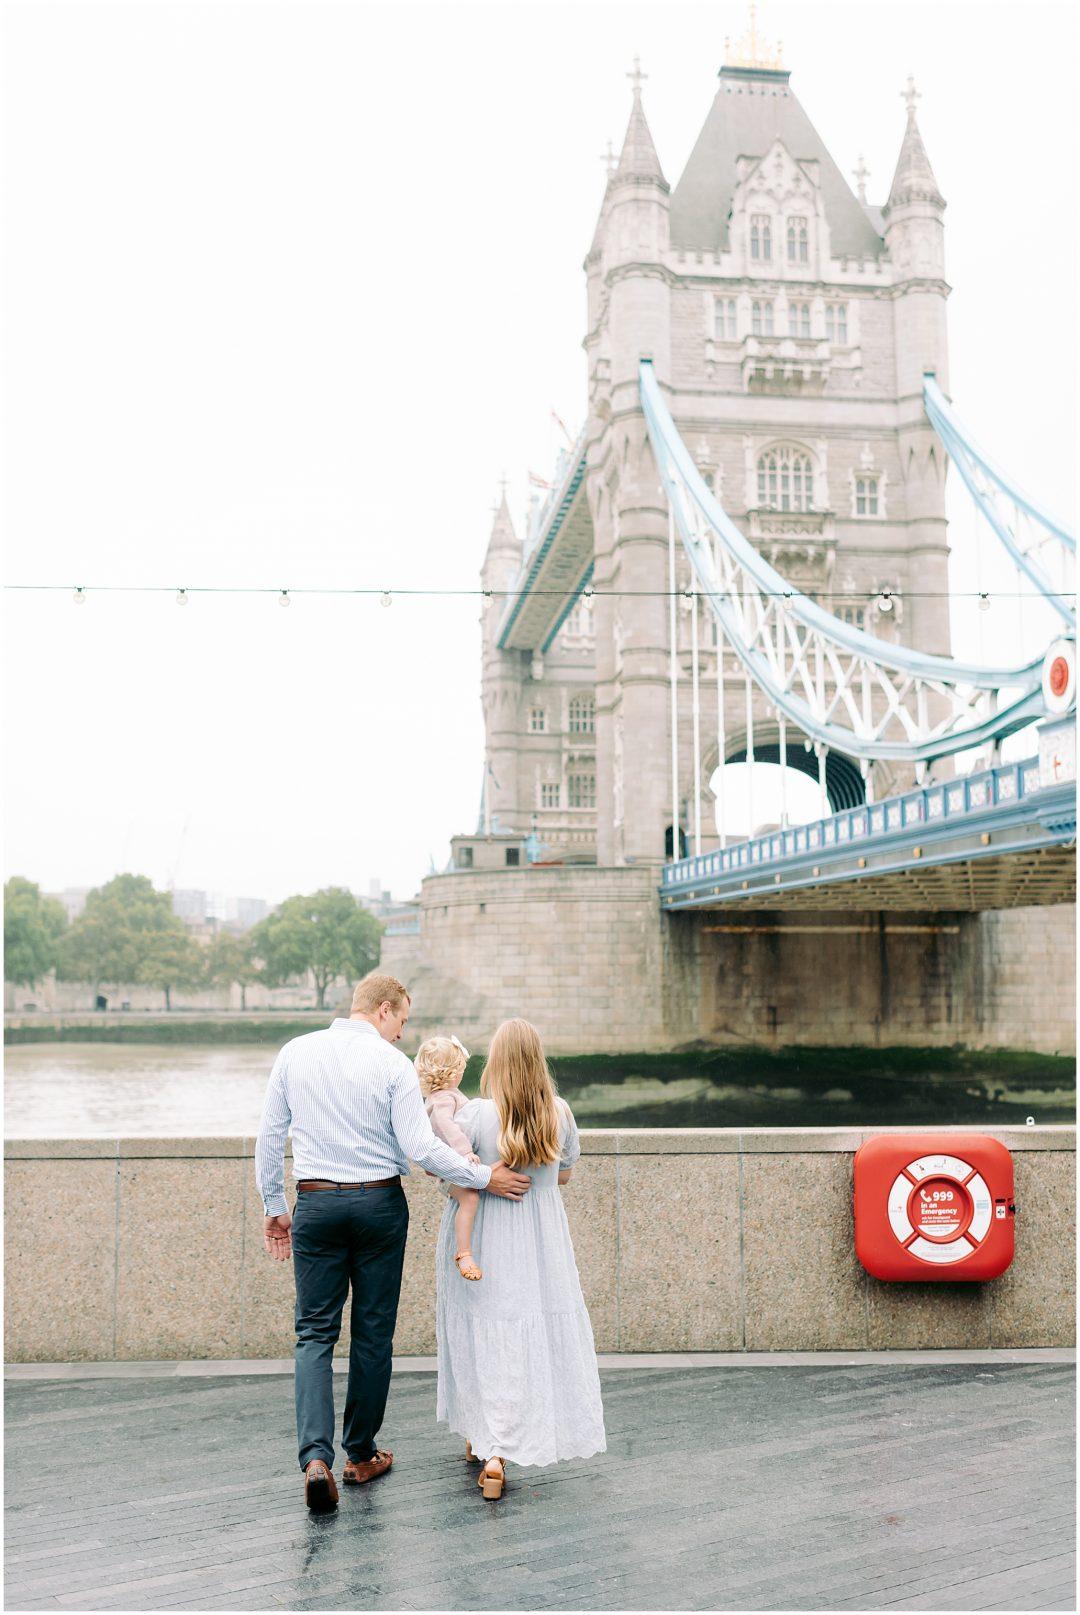 London family photographer, Tower Bridge - family - London family photographer Tower Bridge family shoot Nkimaphotography 0022